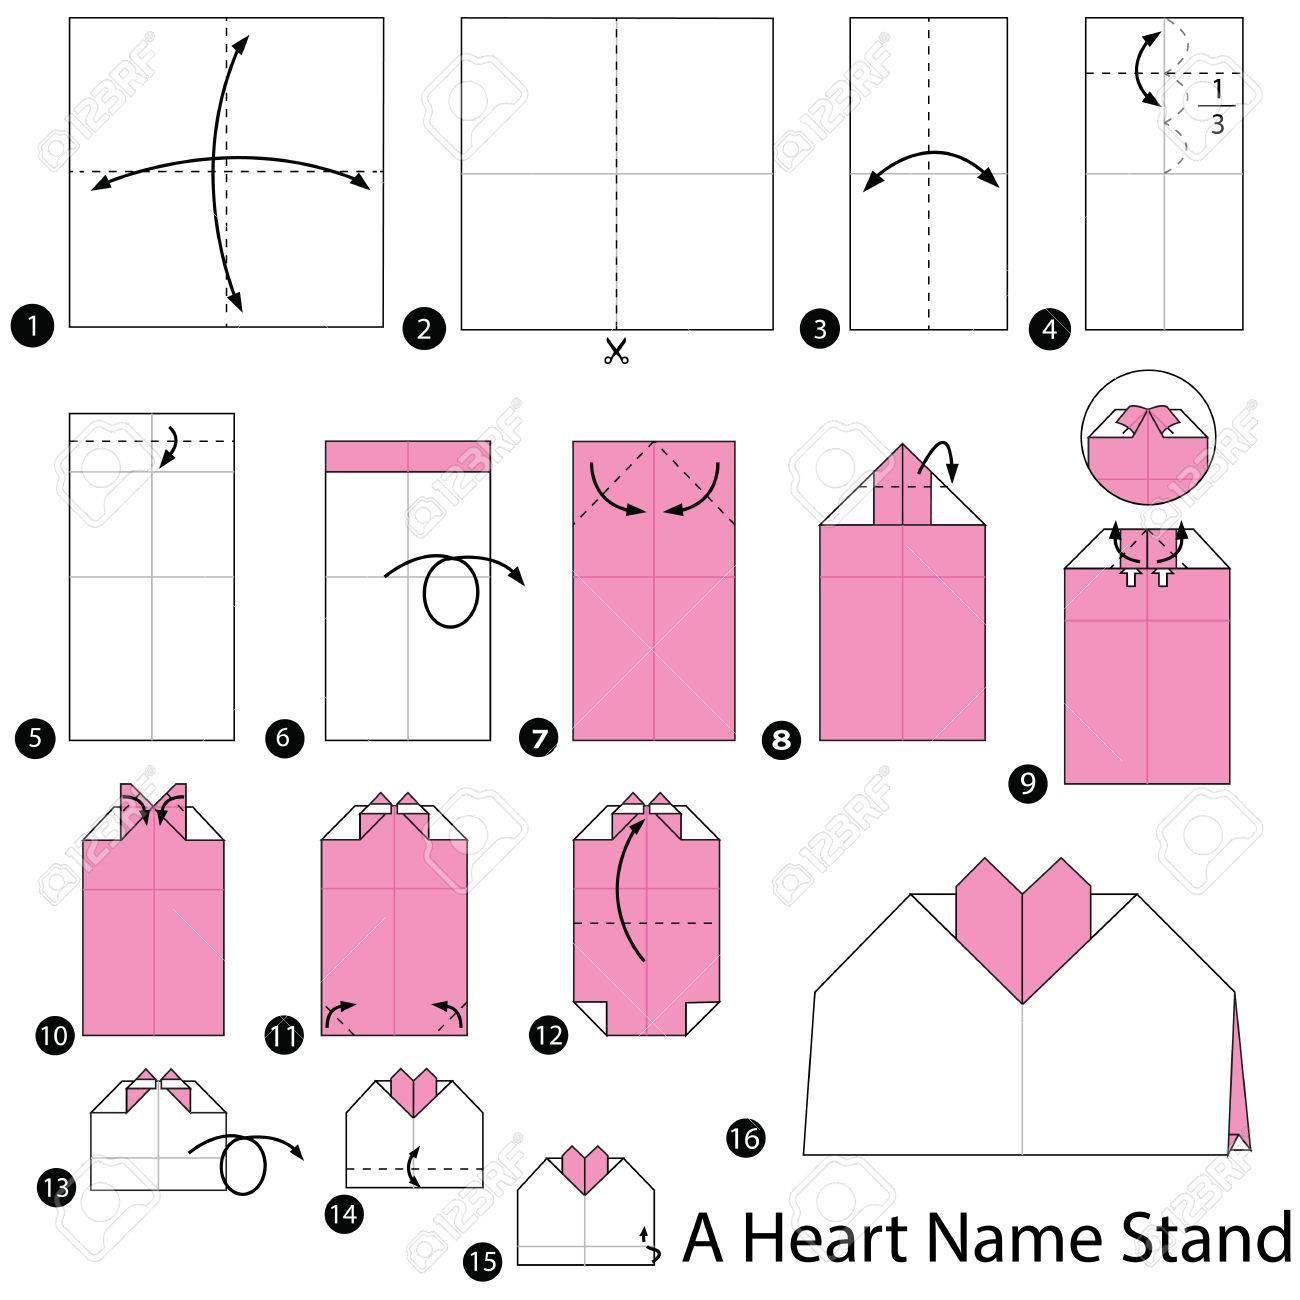 6 easy activities with Valentine's Origami hearts for preschoolers | 1300x1300